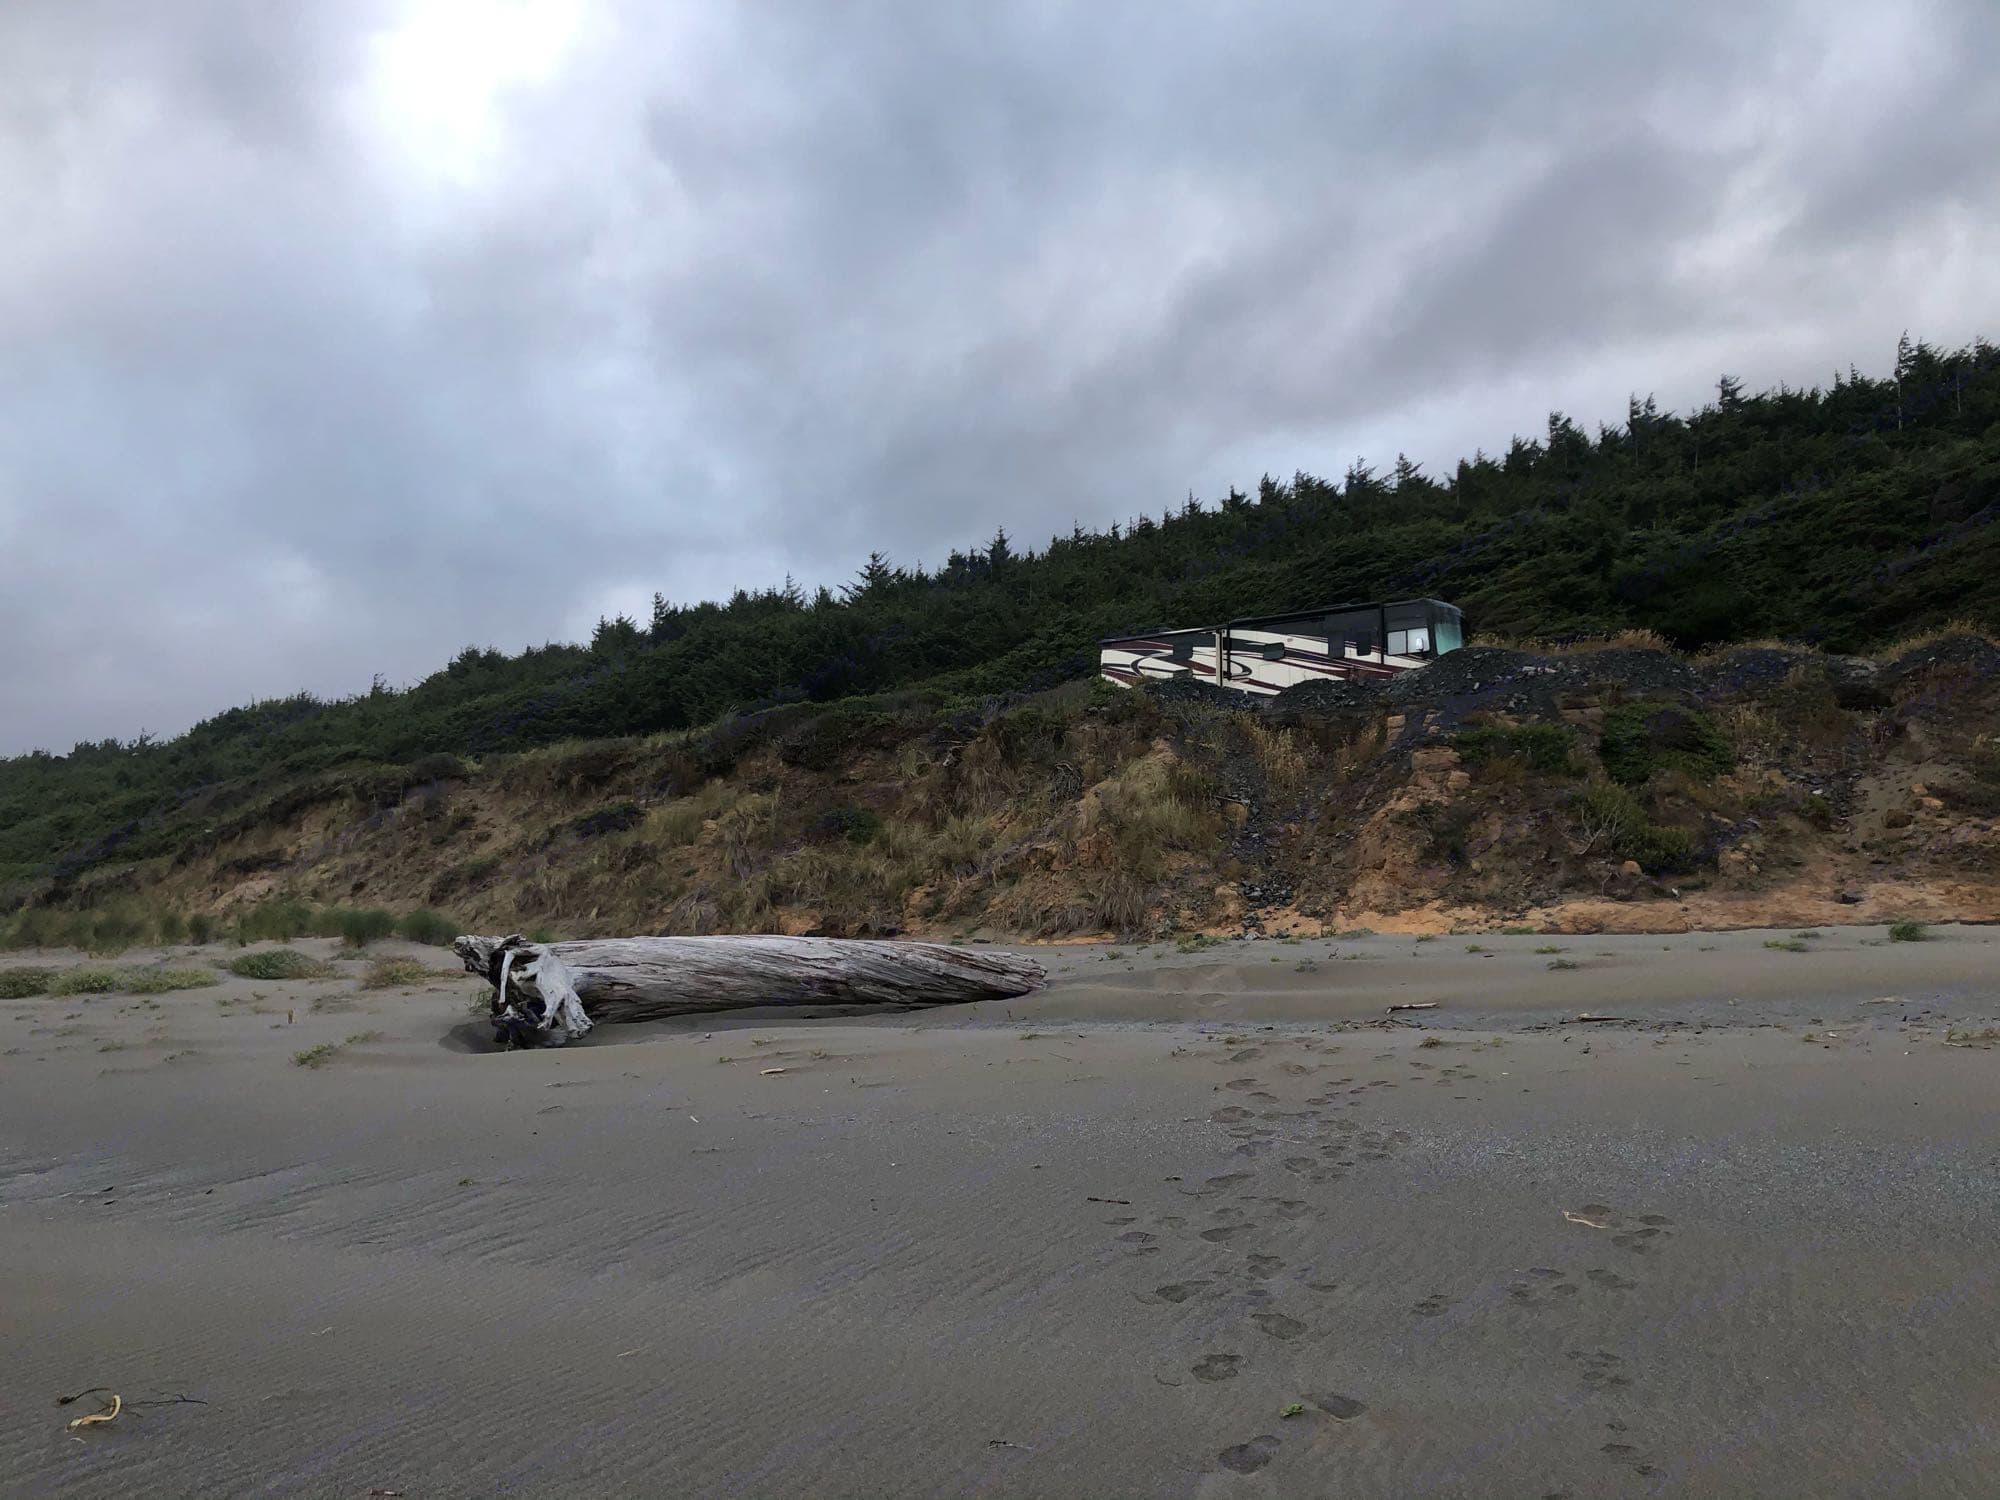 Oregoncoast. Other Other 2014